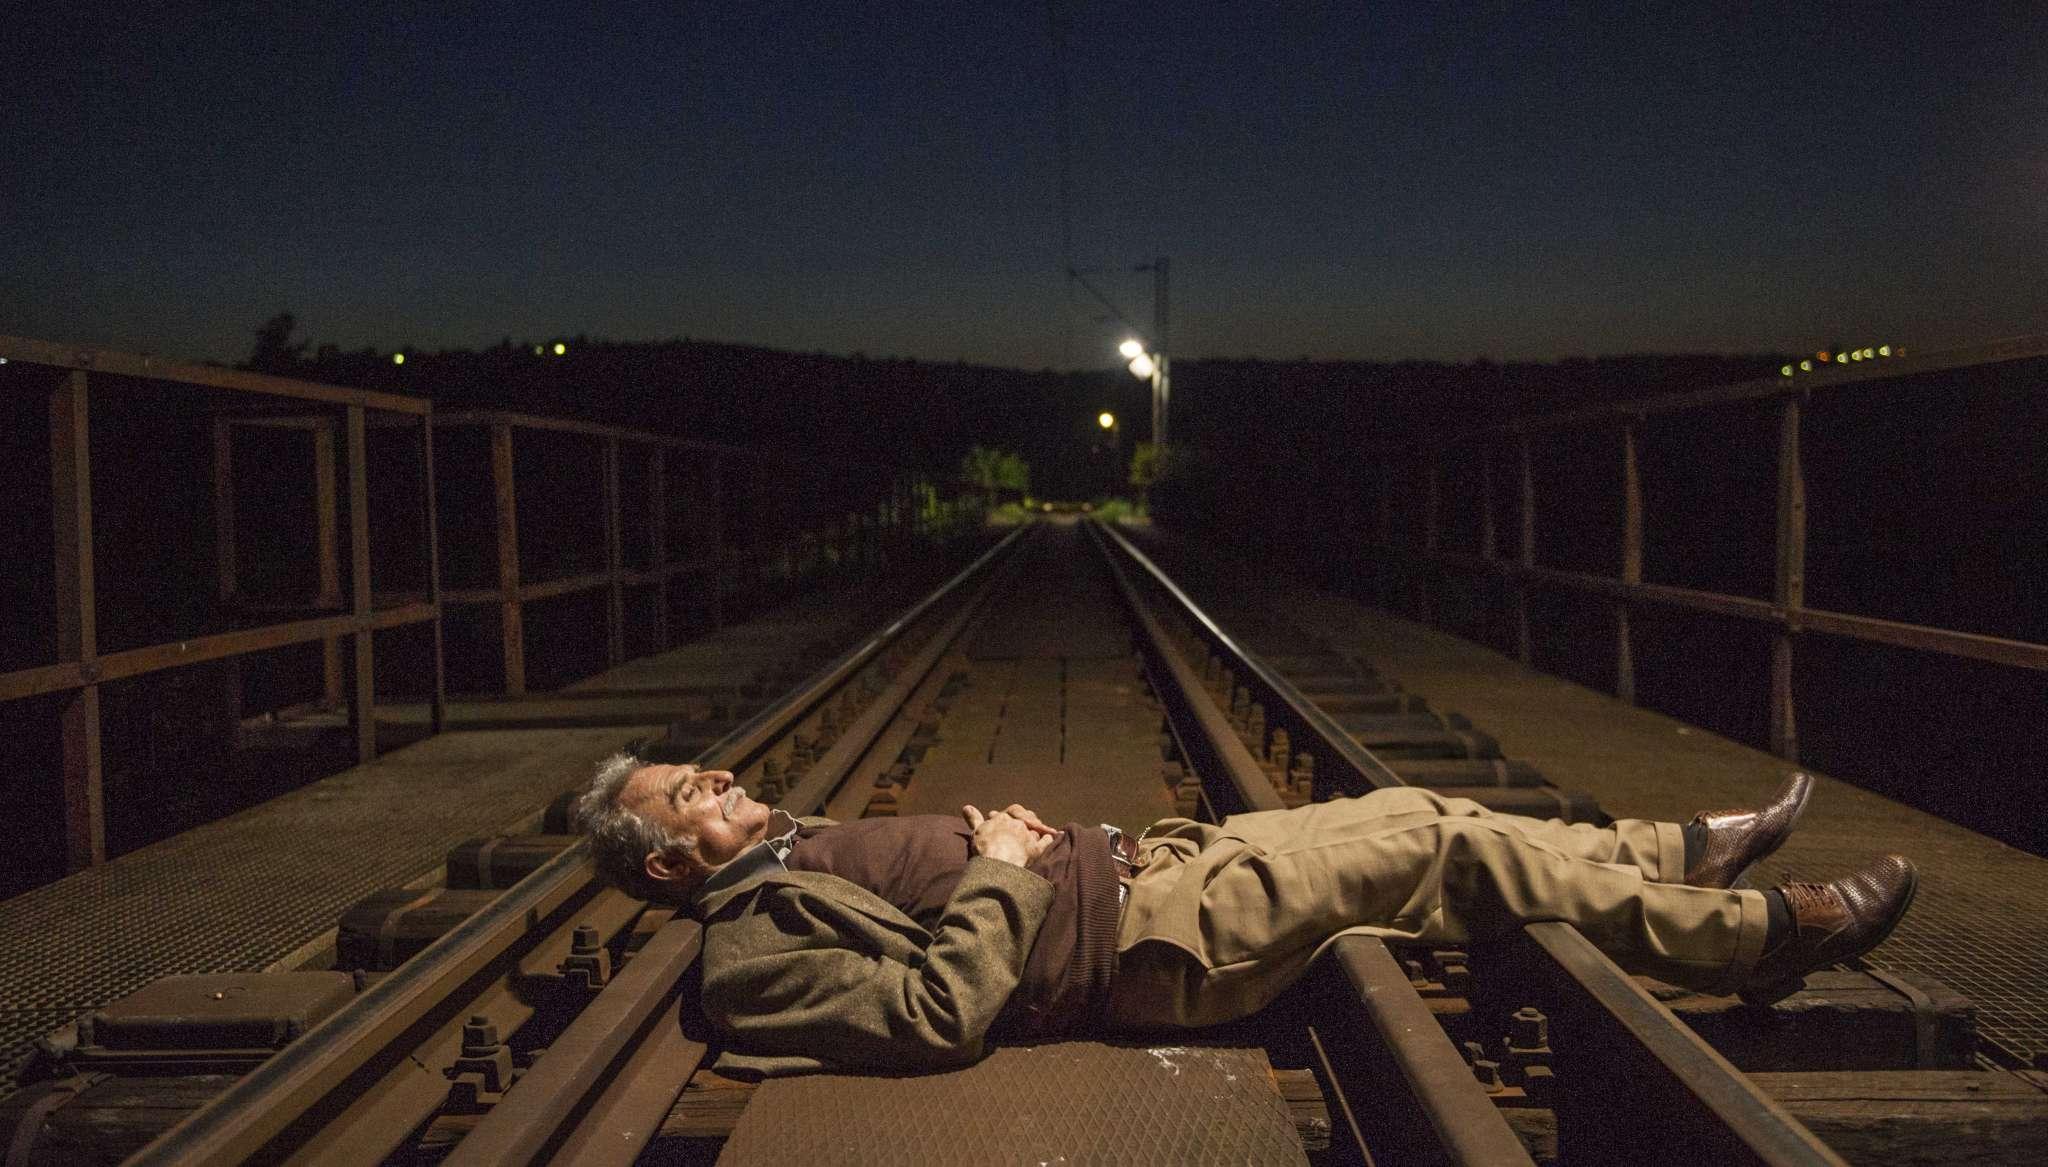 train-drivers-diary-still-3-lazar-ristovski